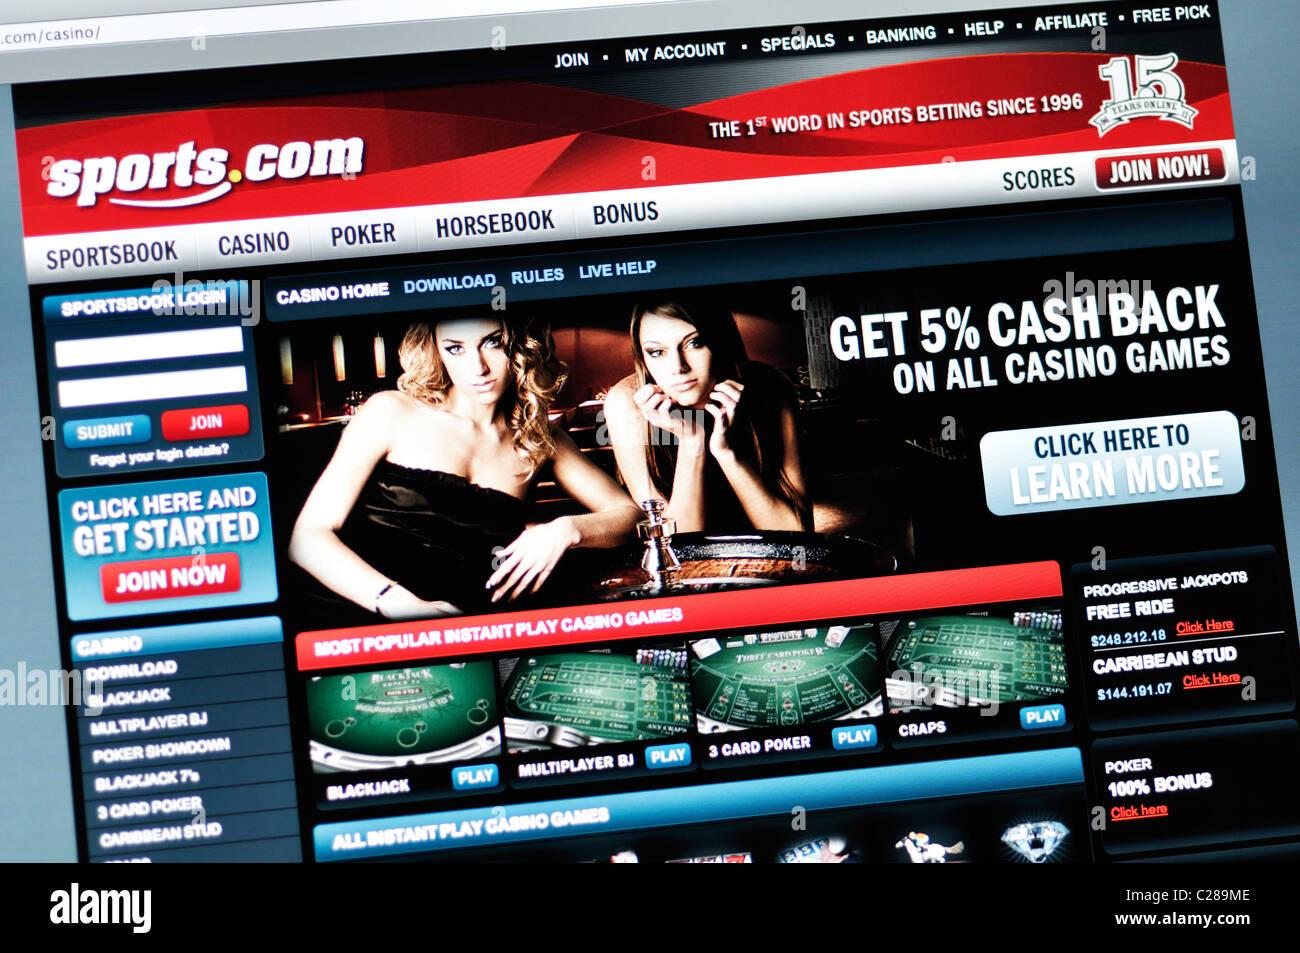 rich casino no deposit bonus 2019